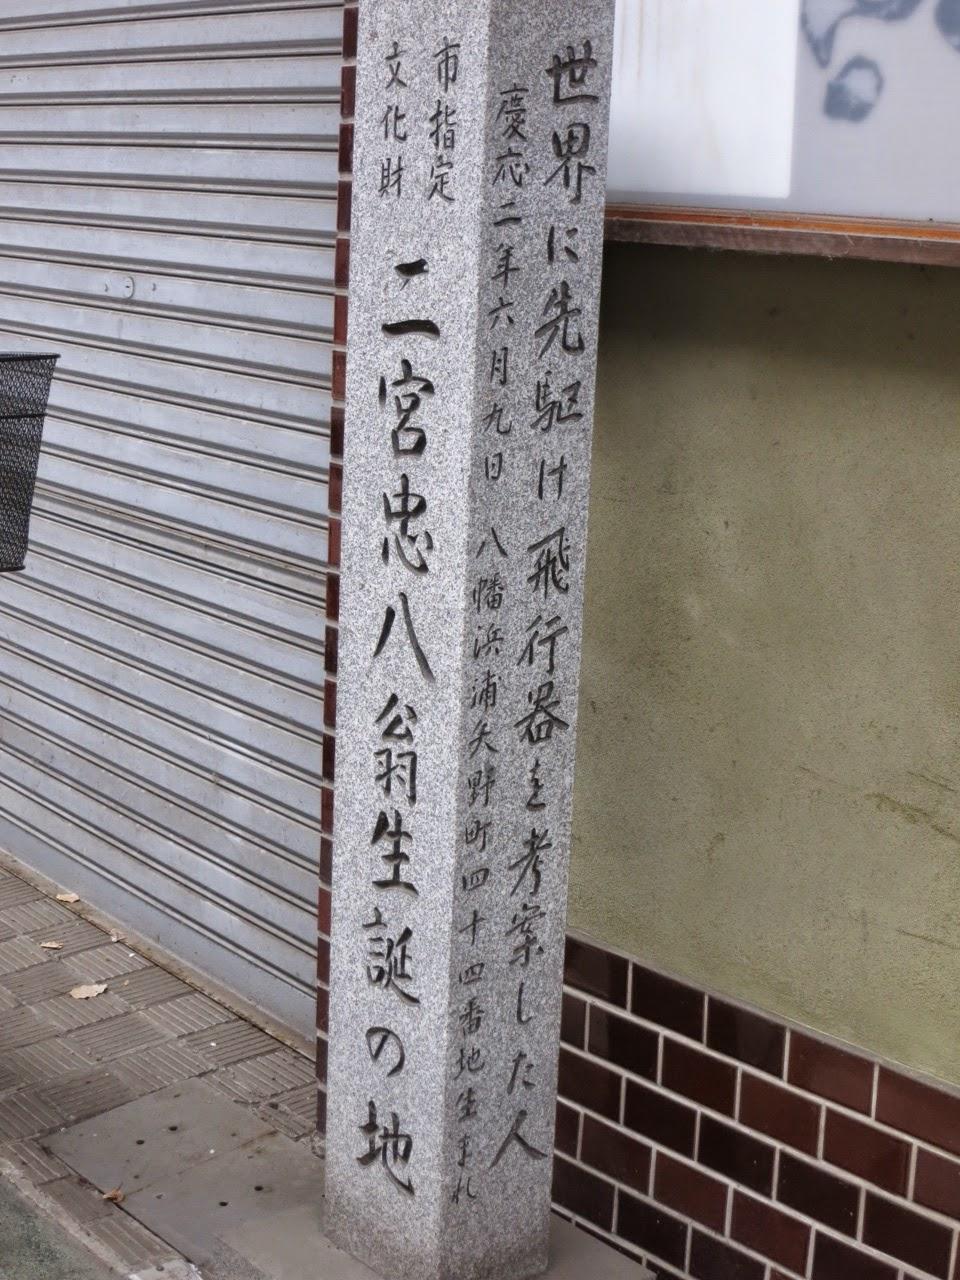 Photo: 八幡浜市商店街(2015年5月) ©2015 久美子君を乗せるのだから  ★画像使用記事 『旅の重さ』 http://inagara.octsky.net/tabino-omosa